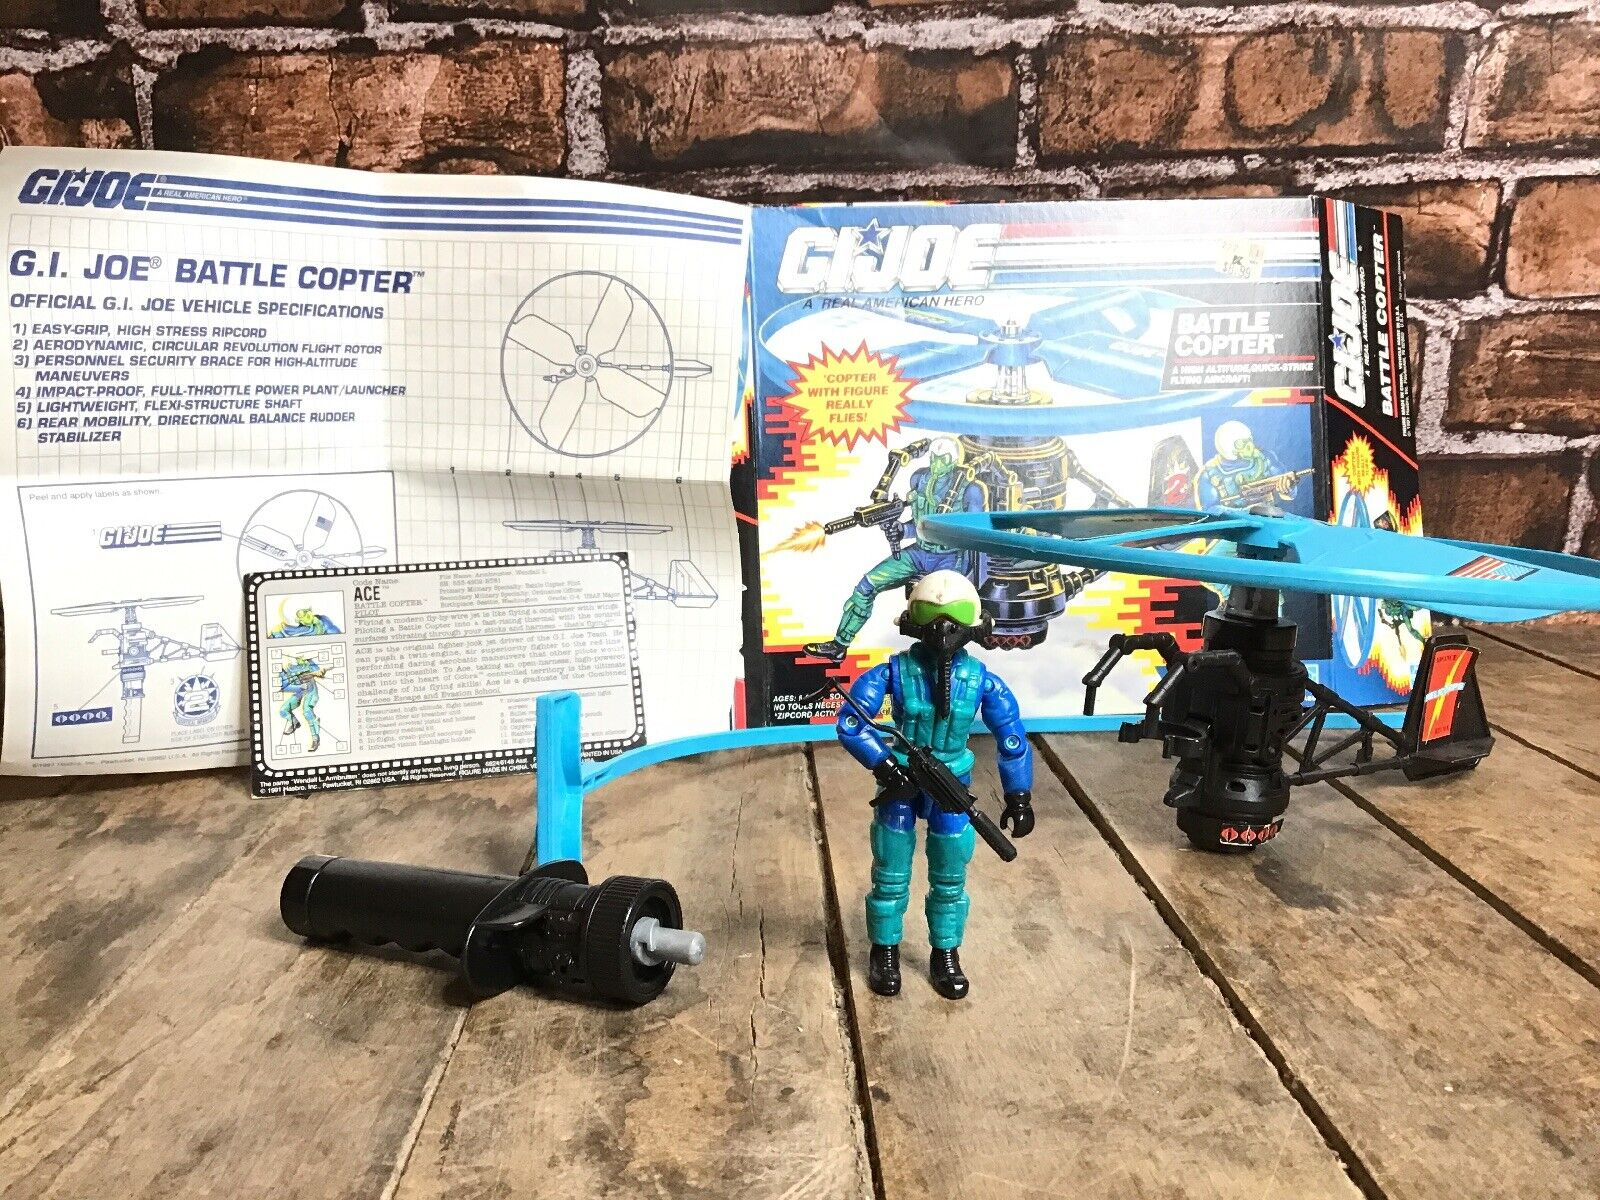 Gi Joe Cobra batalla Copter con piloto ACE (1991) Caja abierta de menta 100% completo un verdadero héroe americano